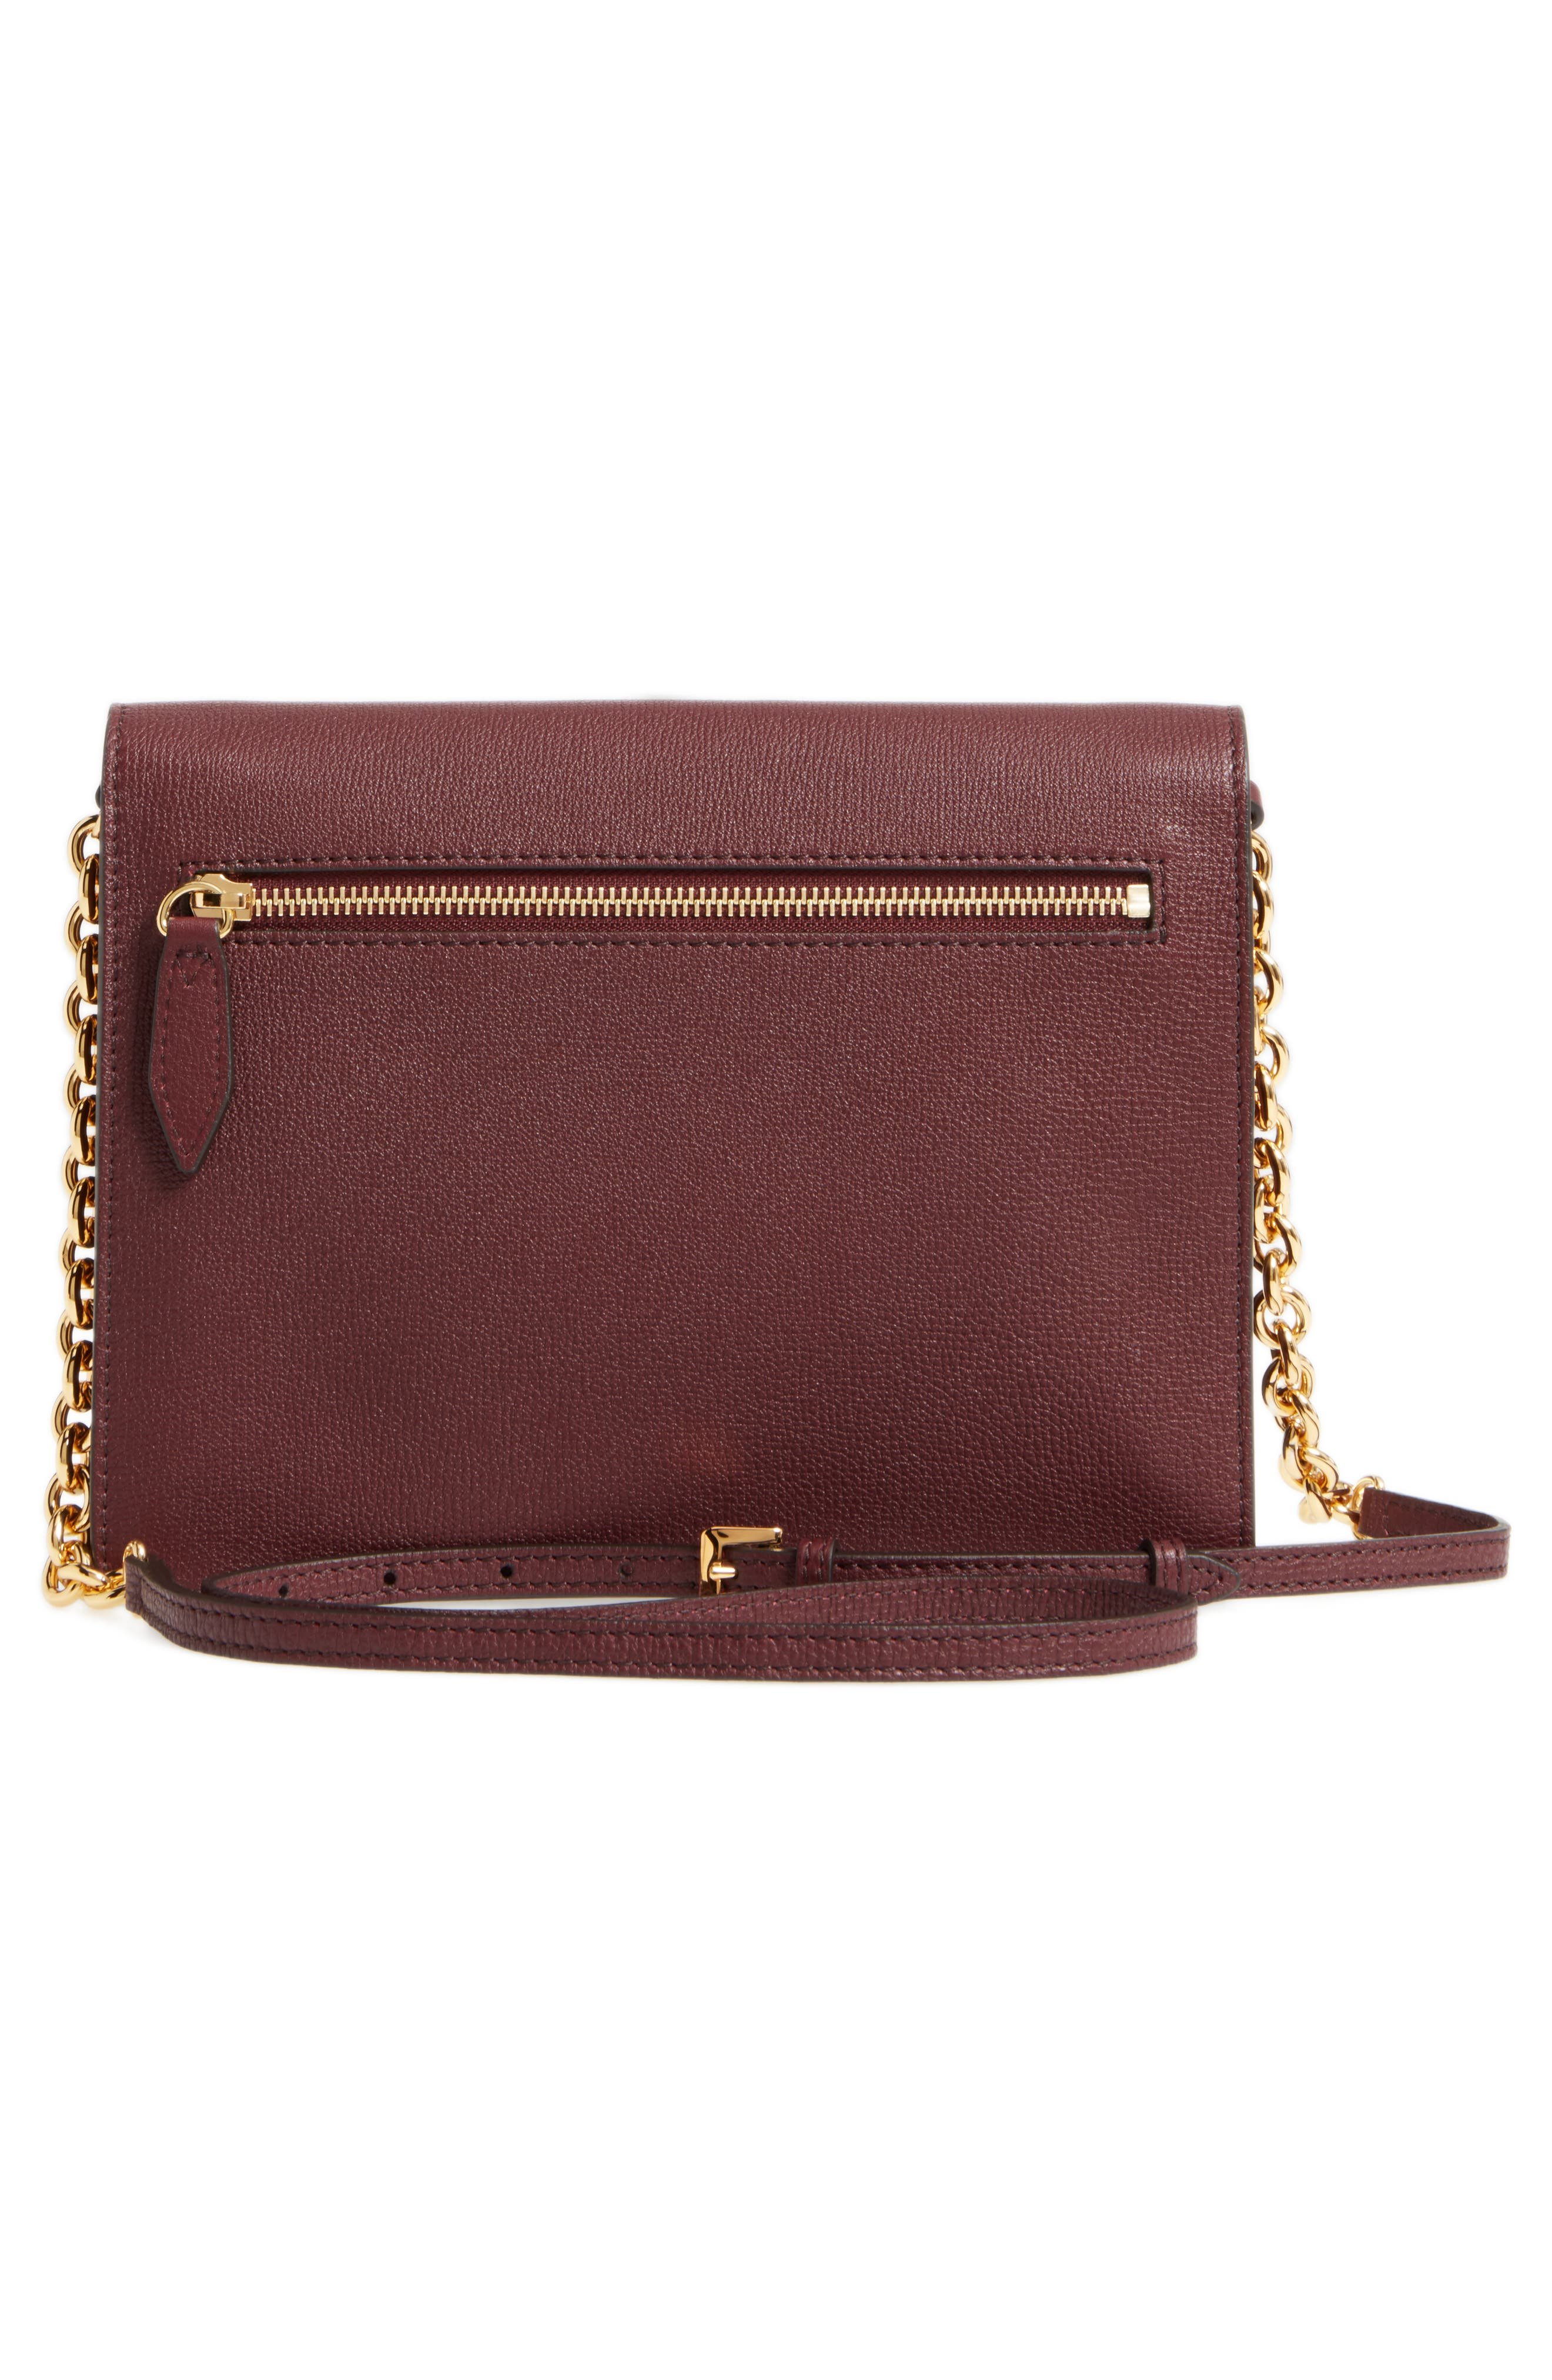 Macken Leather Derby Crossbody Bag,                             Alternate thumbnail 3, color,                             606